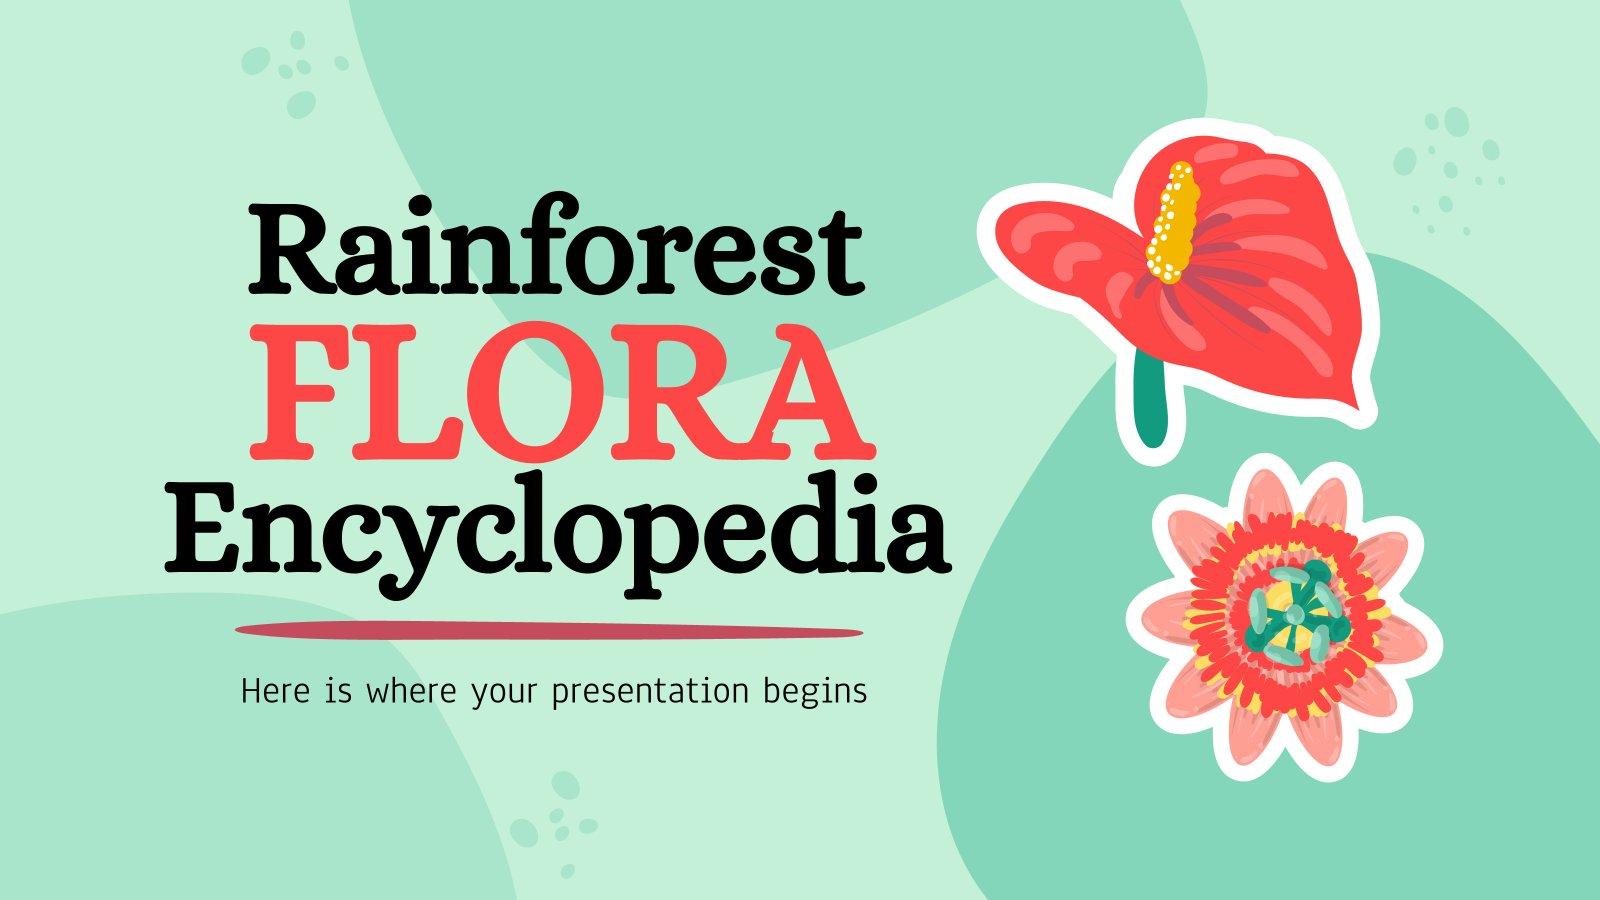 Rainforest Flora Encyclopedia presentation template